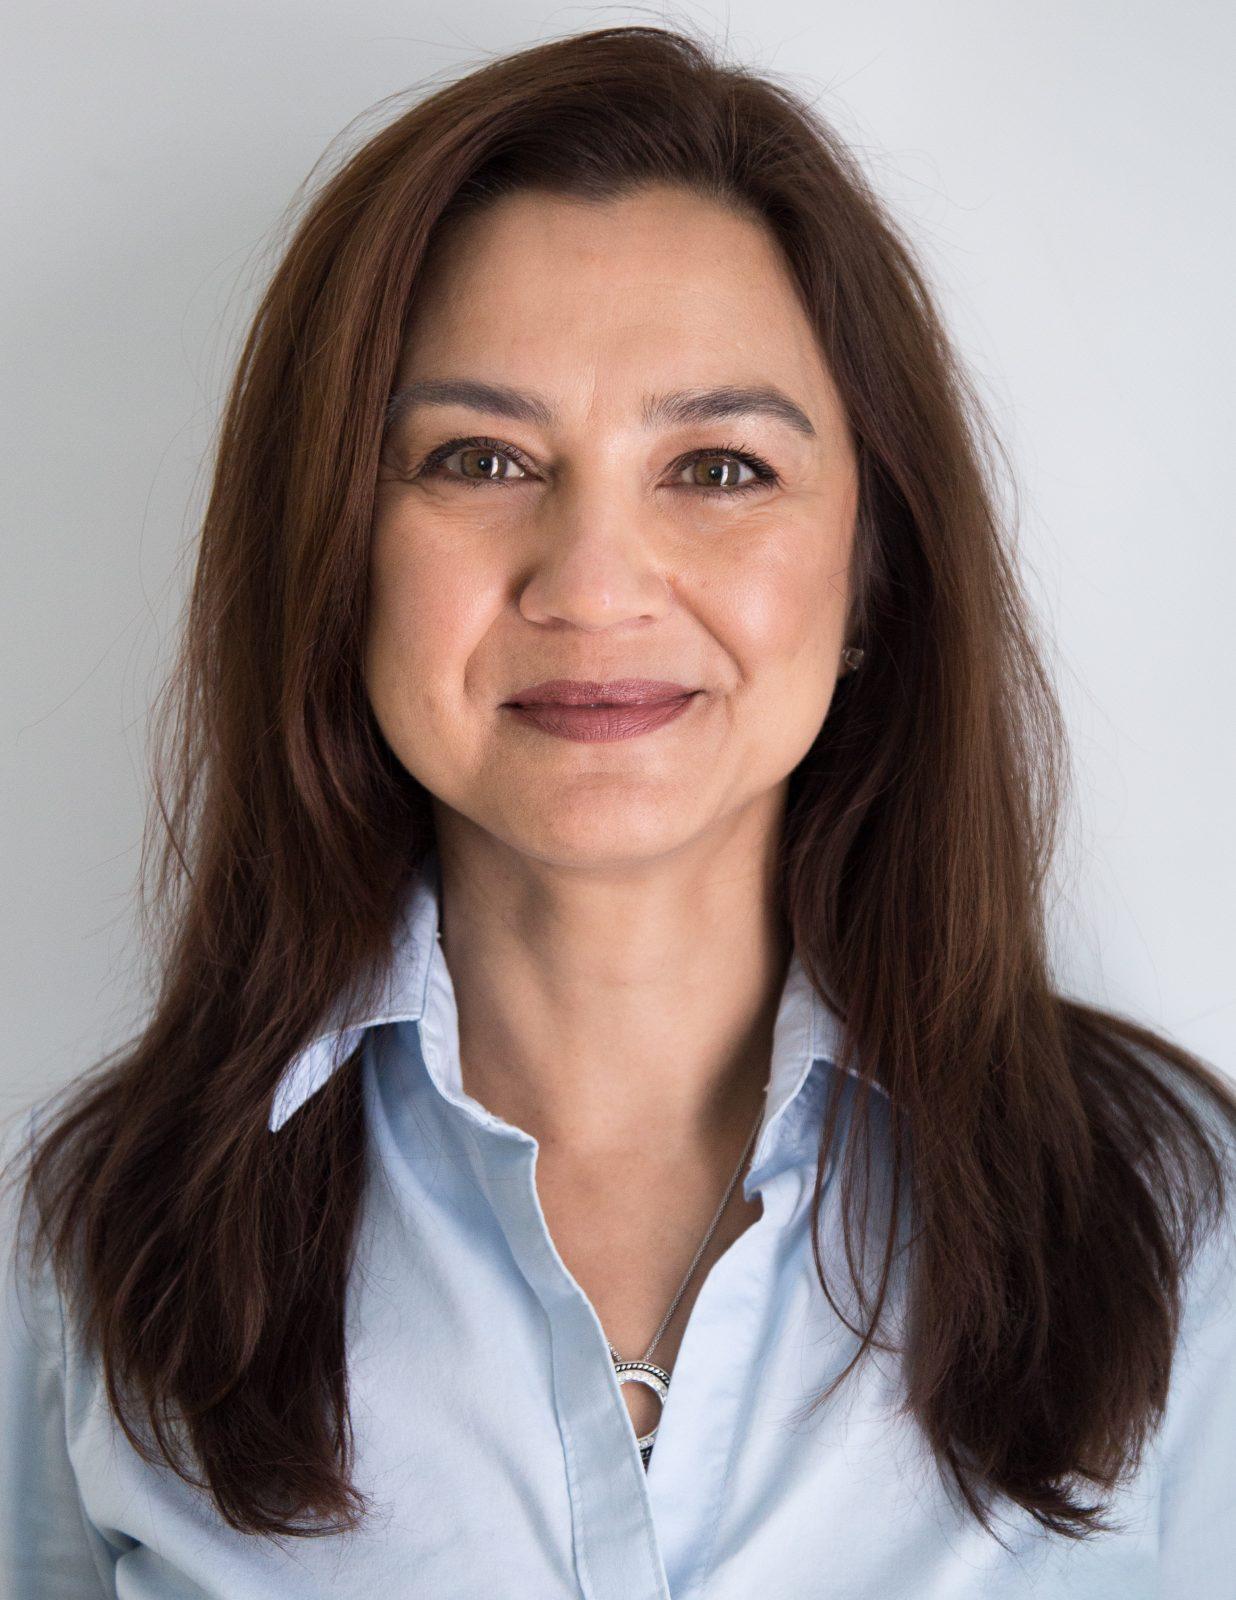 02 - Deinah Lawrence - Senior Sales, Marketing + Event Manager